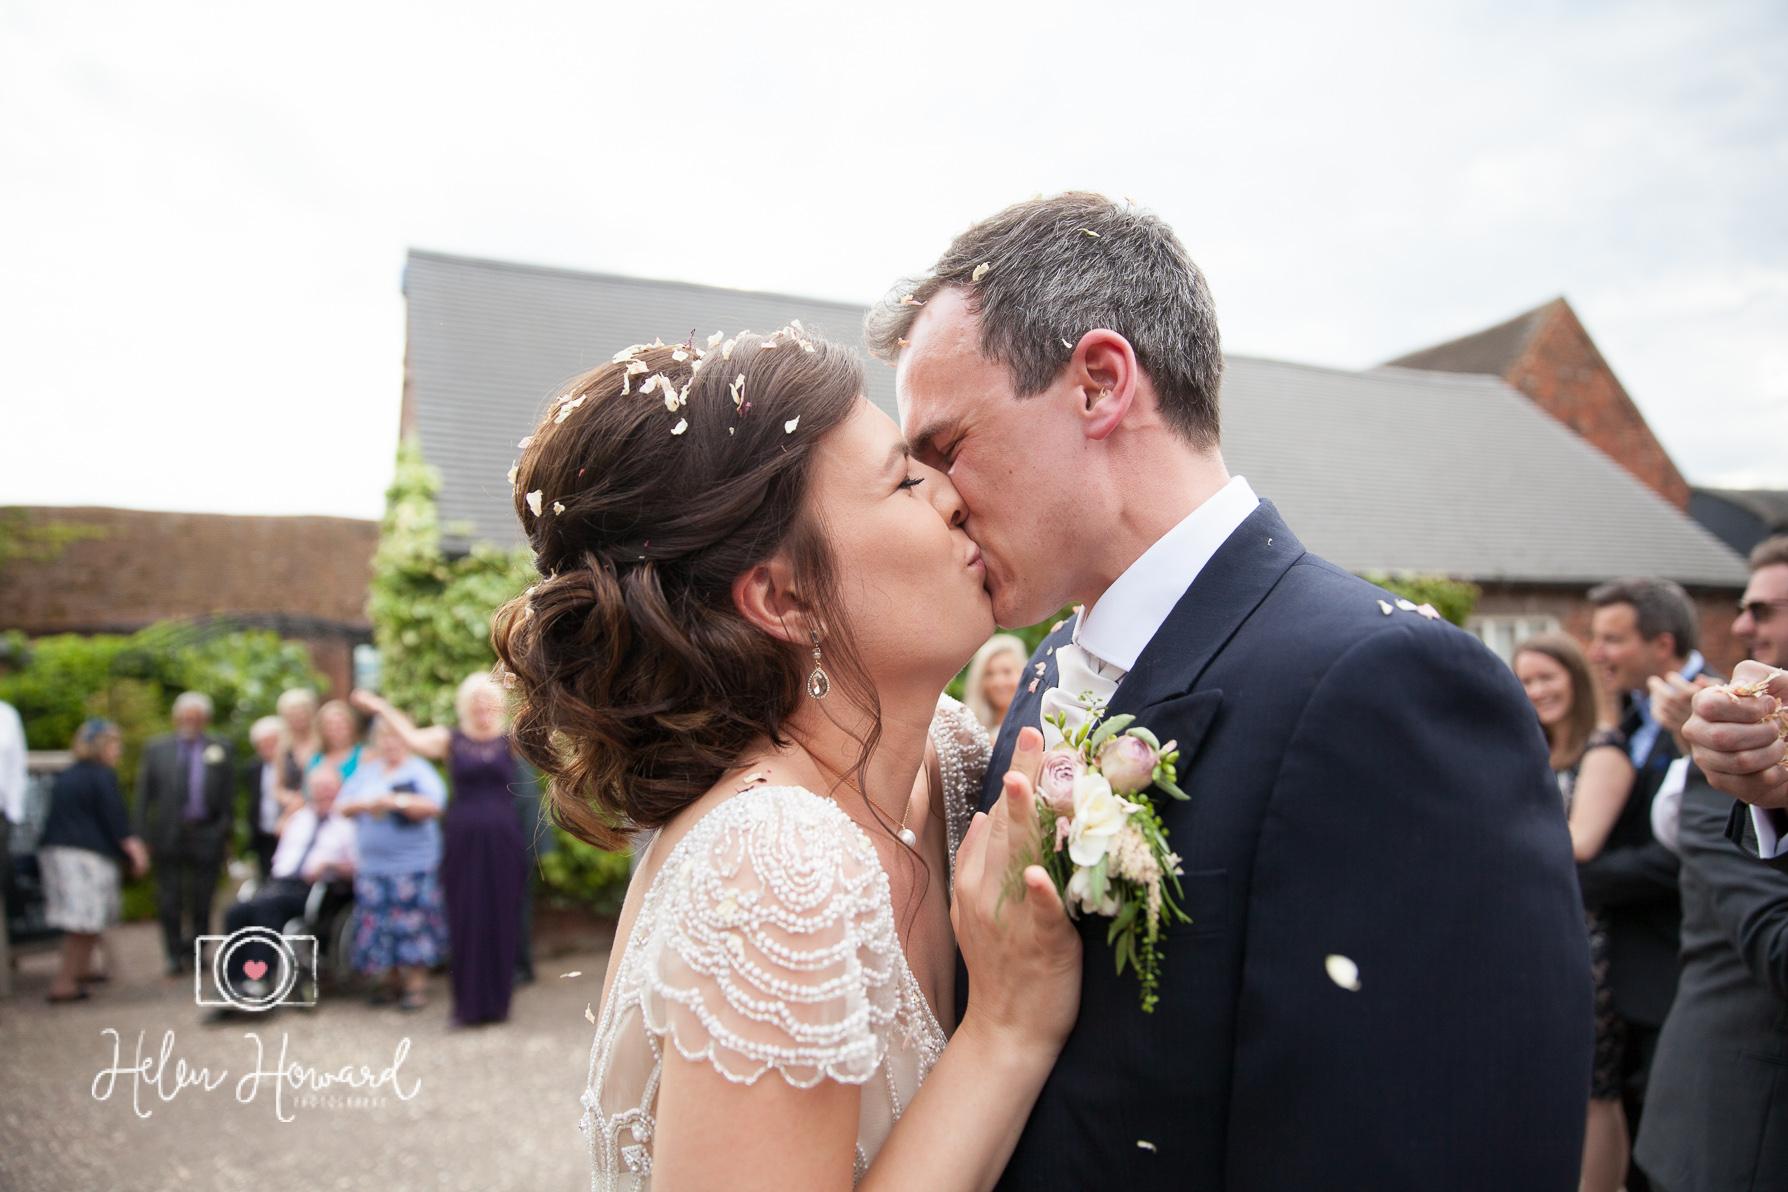 Helen Howard Photography Packington Moor Wedding-103.jpg